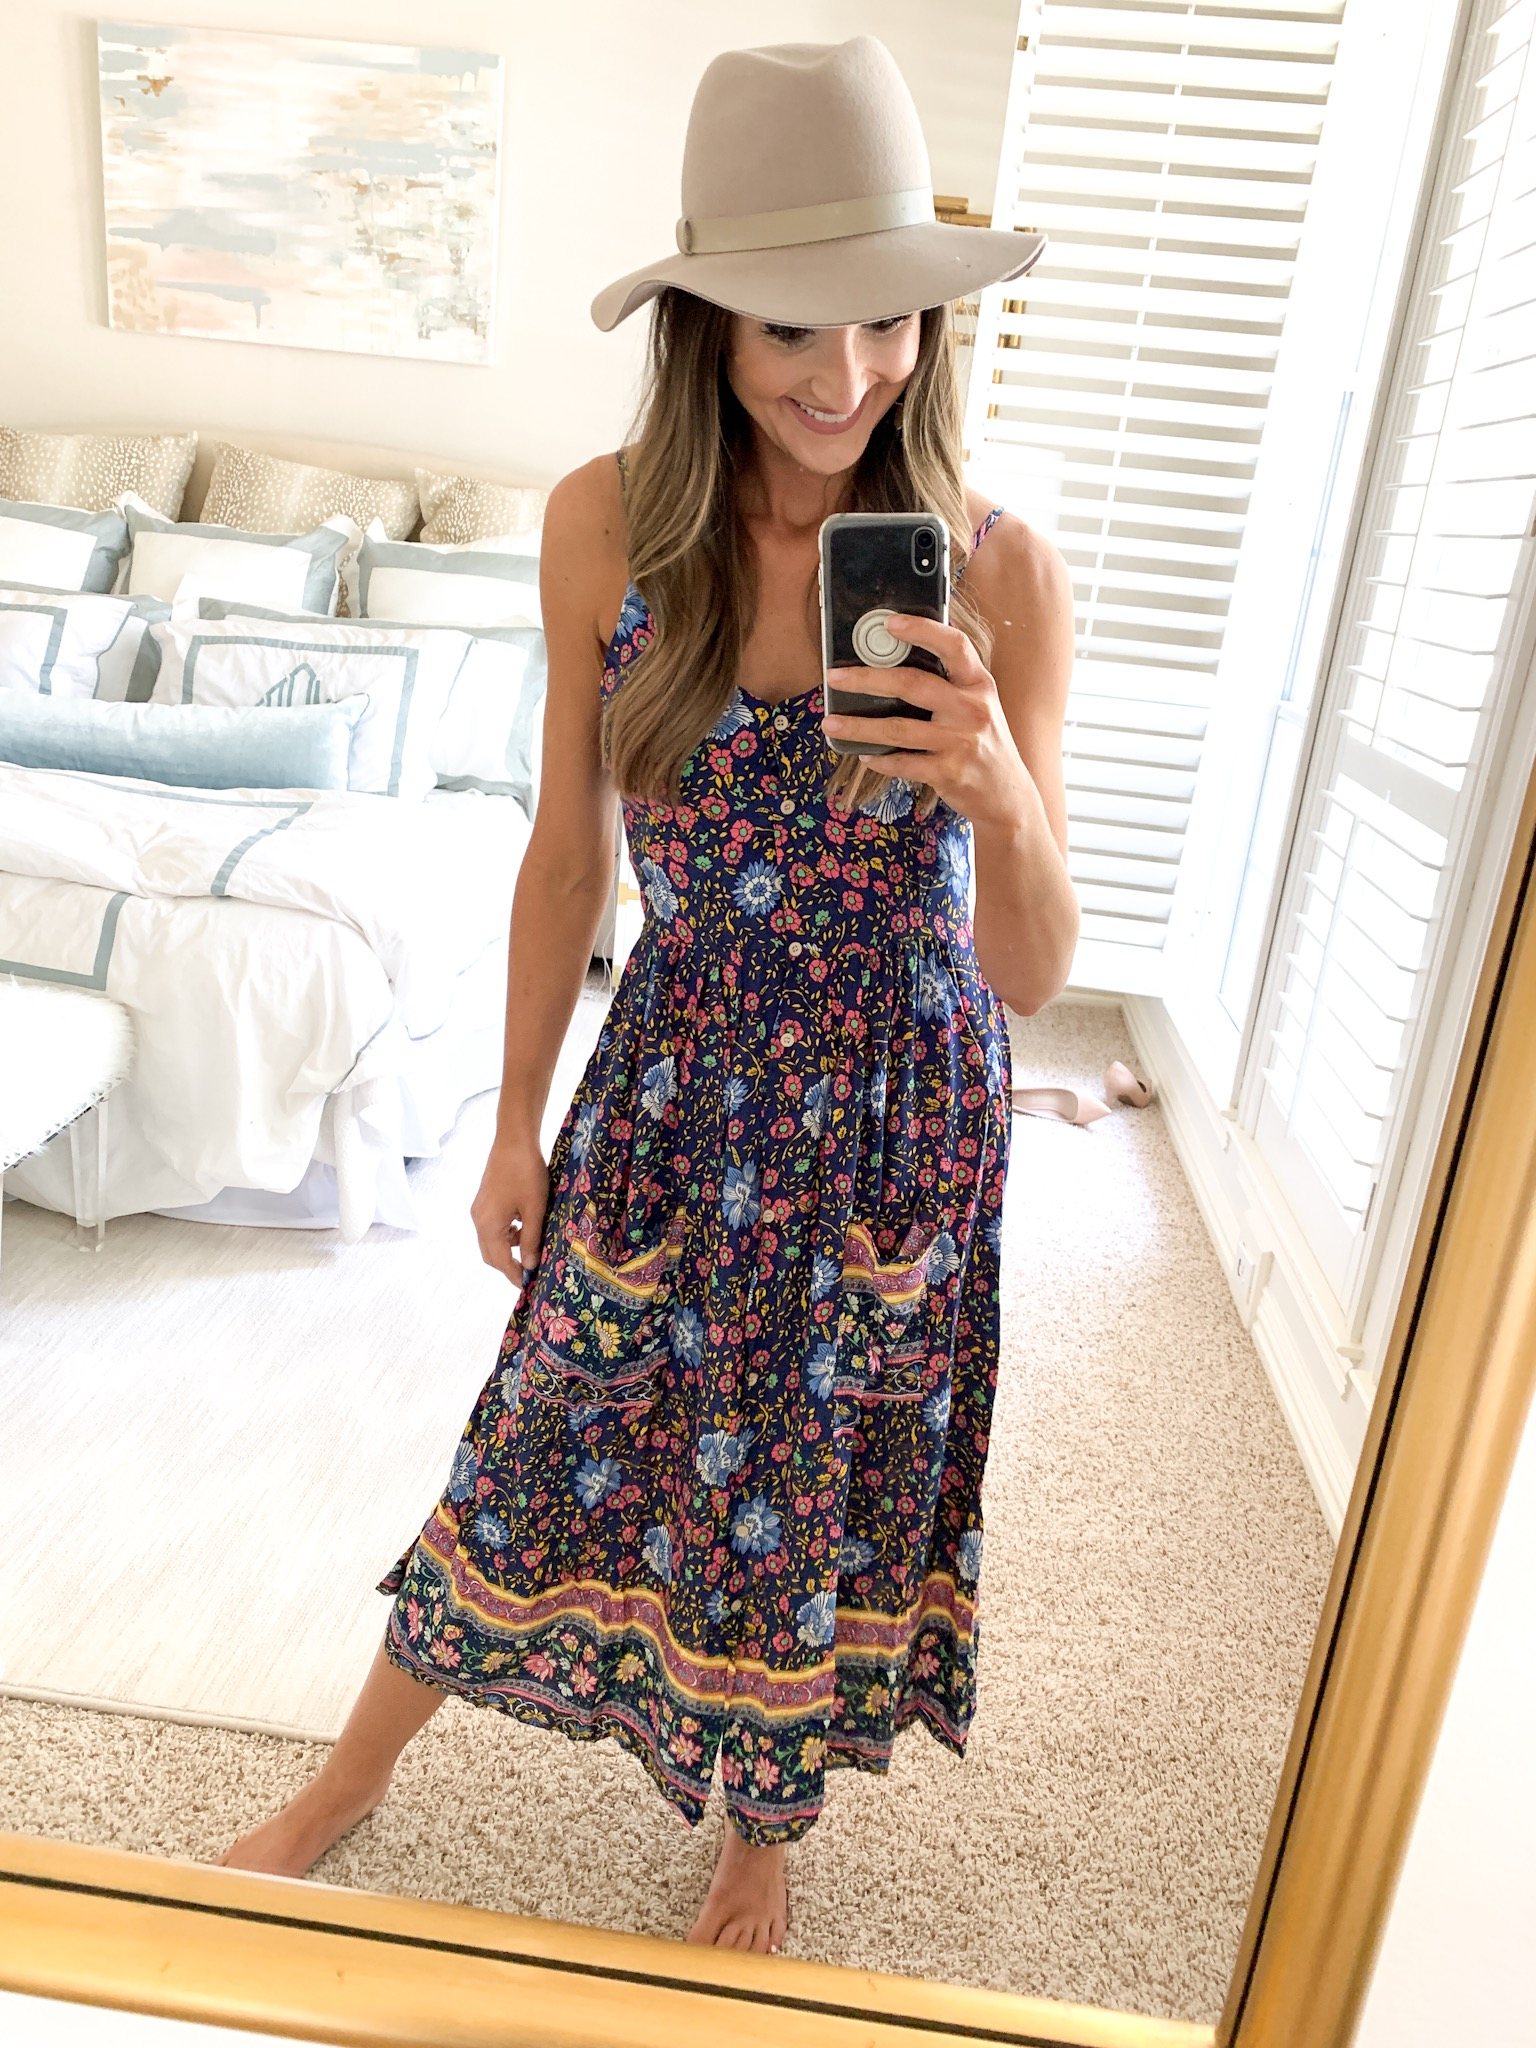 Amazon Fashion Haul | Style Your Senses | Amazon Prime haul | Boho Dress